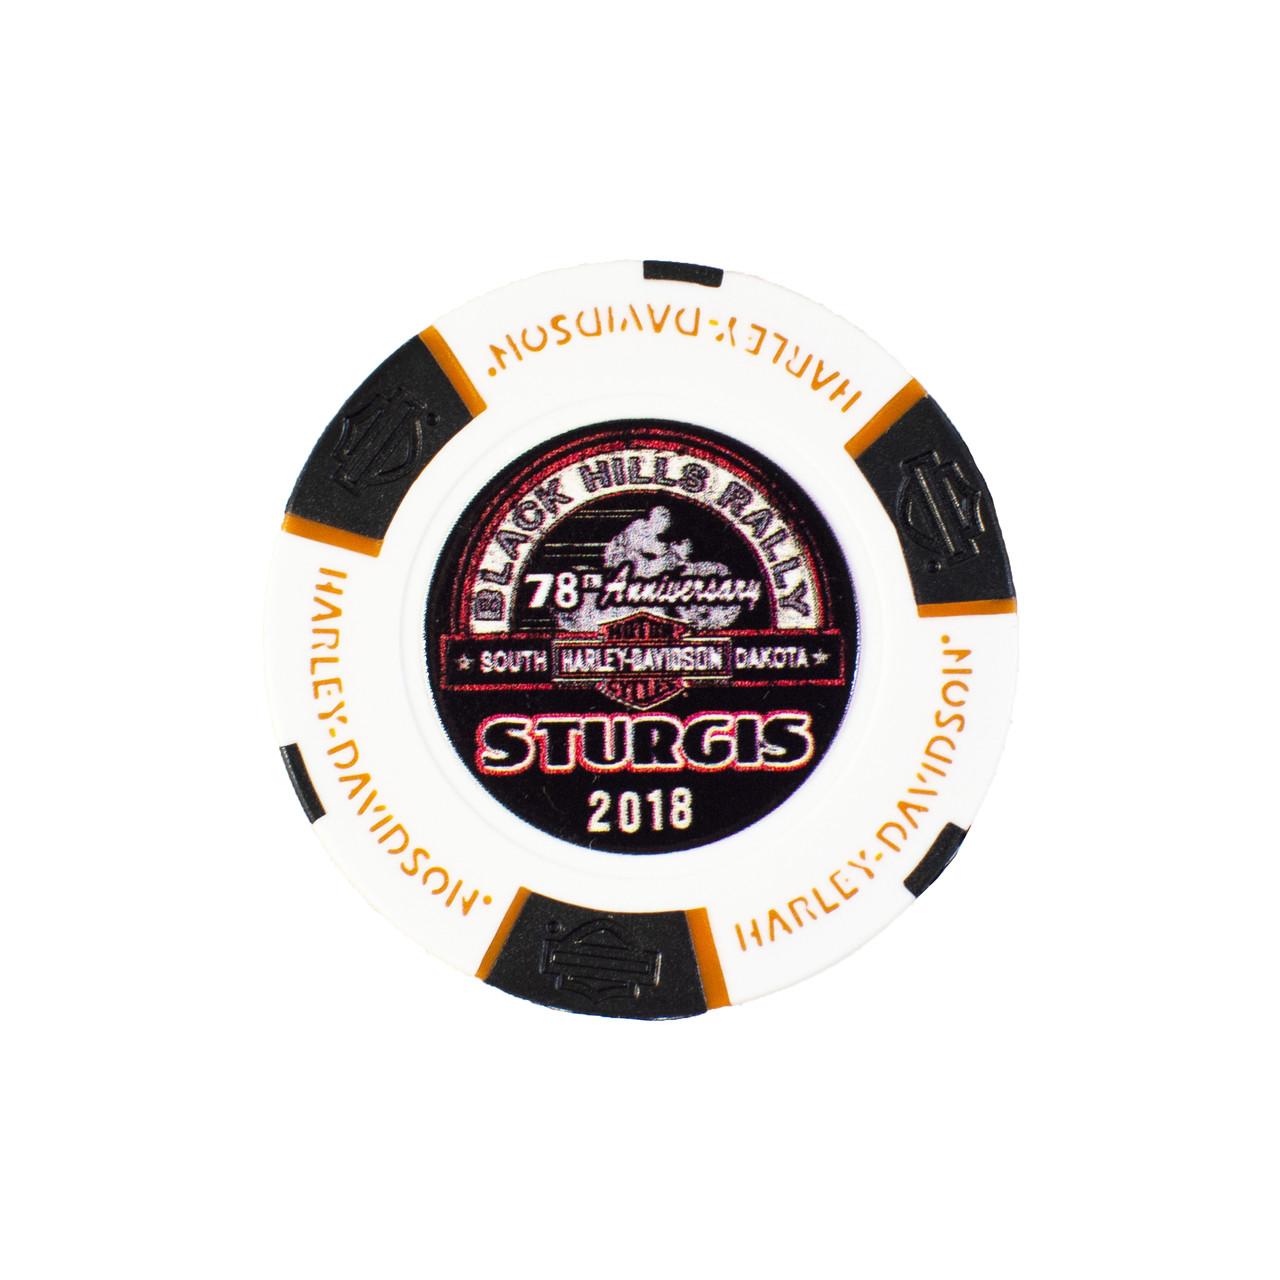 Harley-Davidson Sturgis 2018 Black Hills Rally 78th Bandana